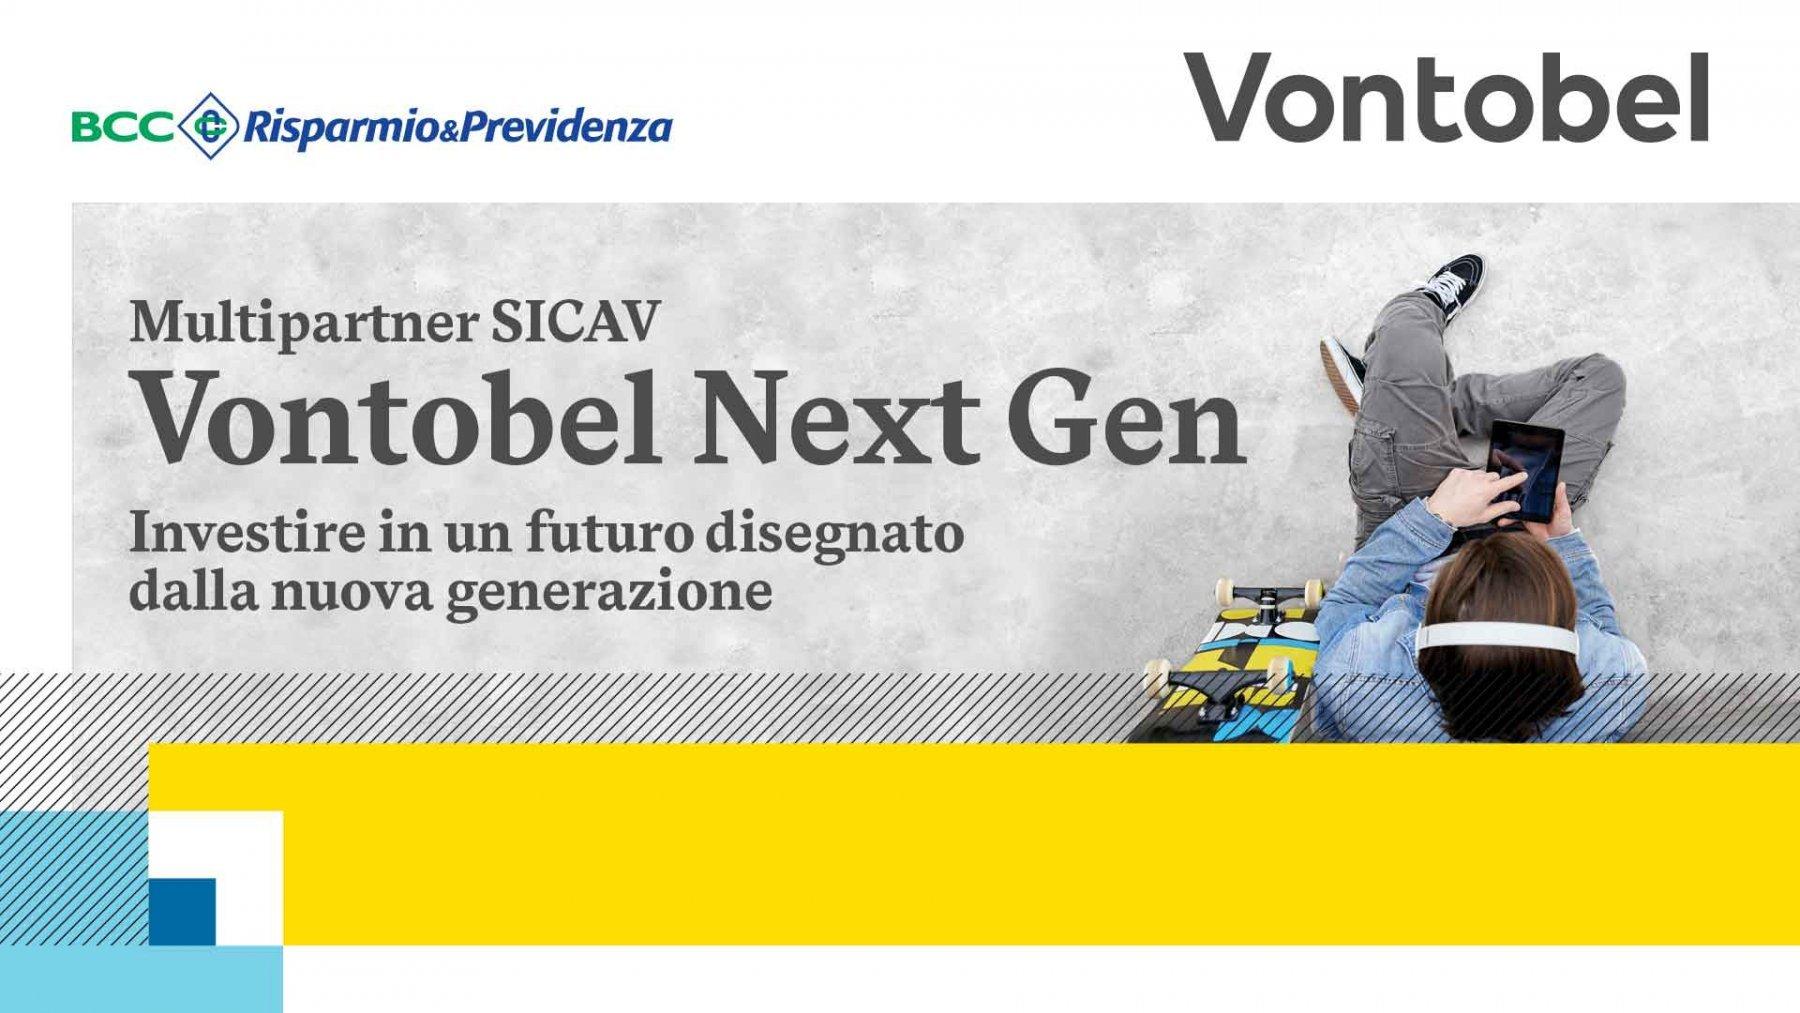 Vontobel Next Gen